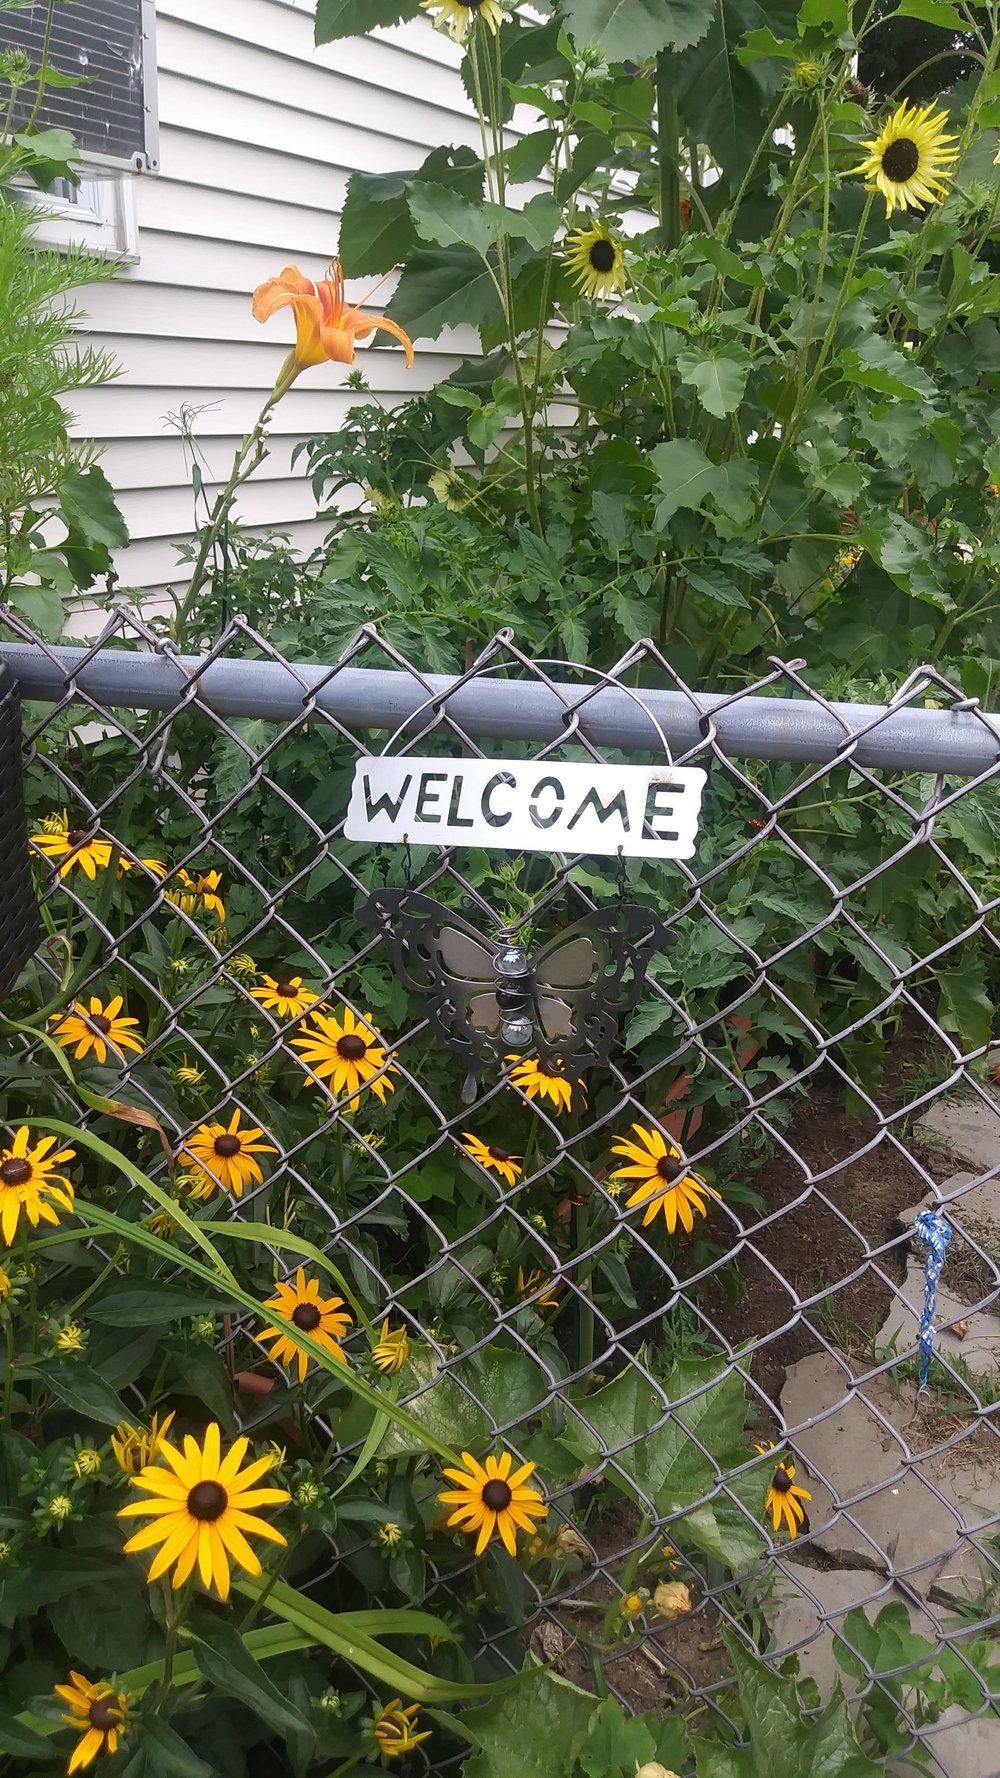 Welcome to Michelle's Garden